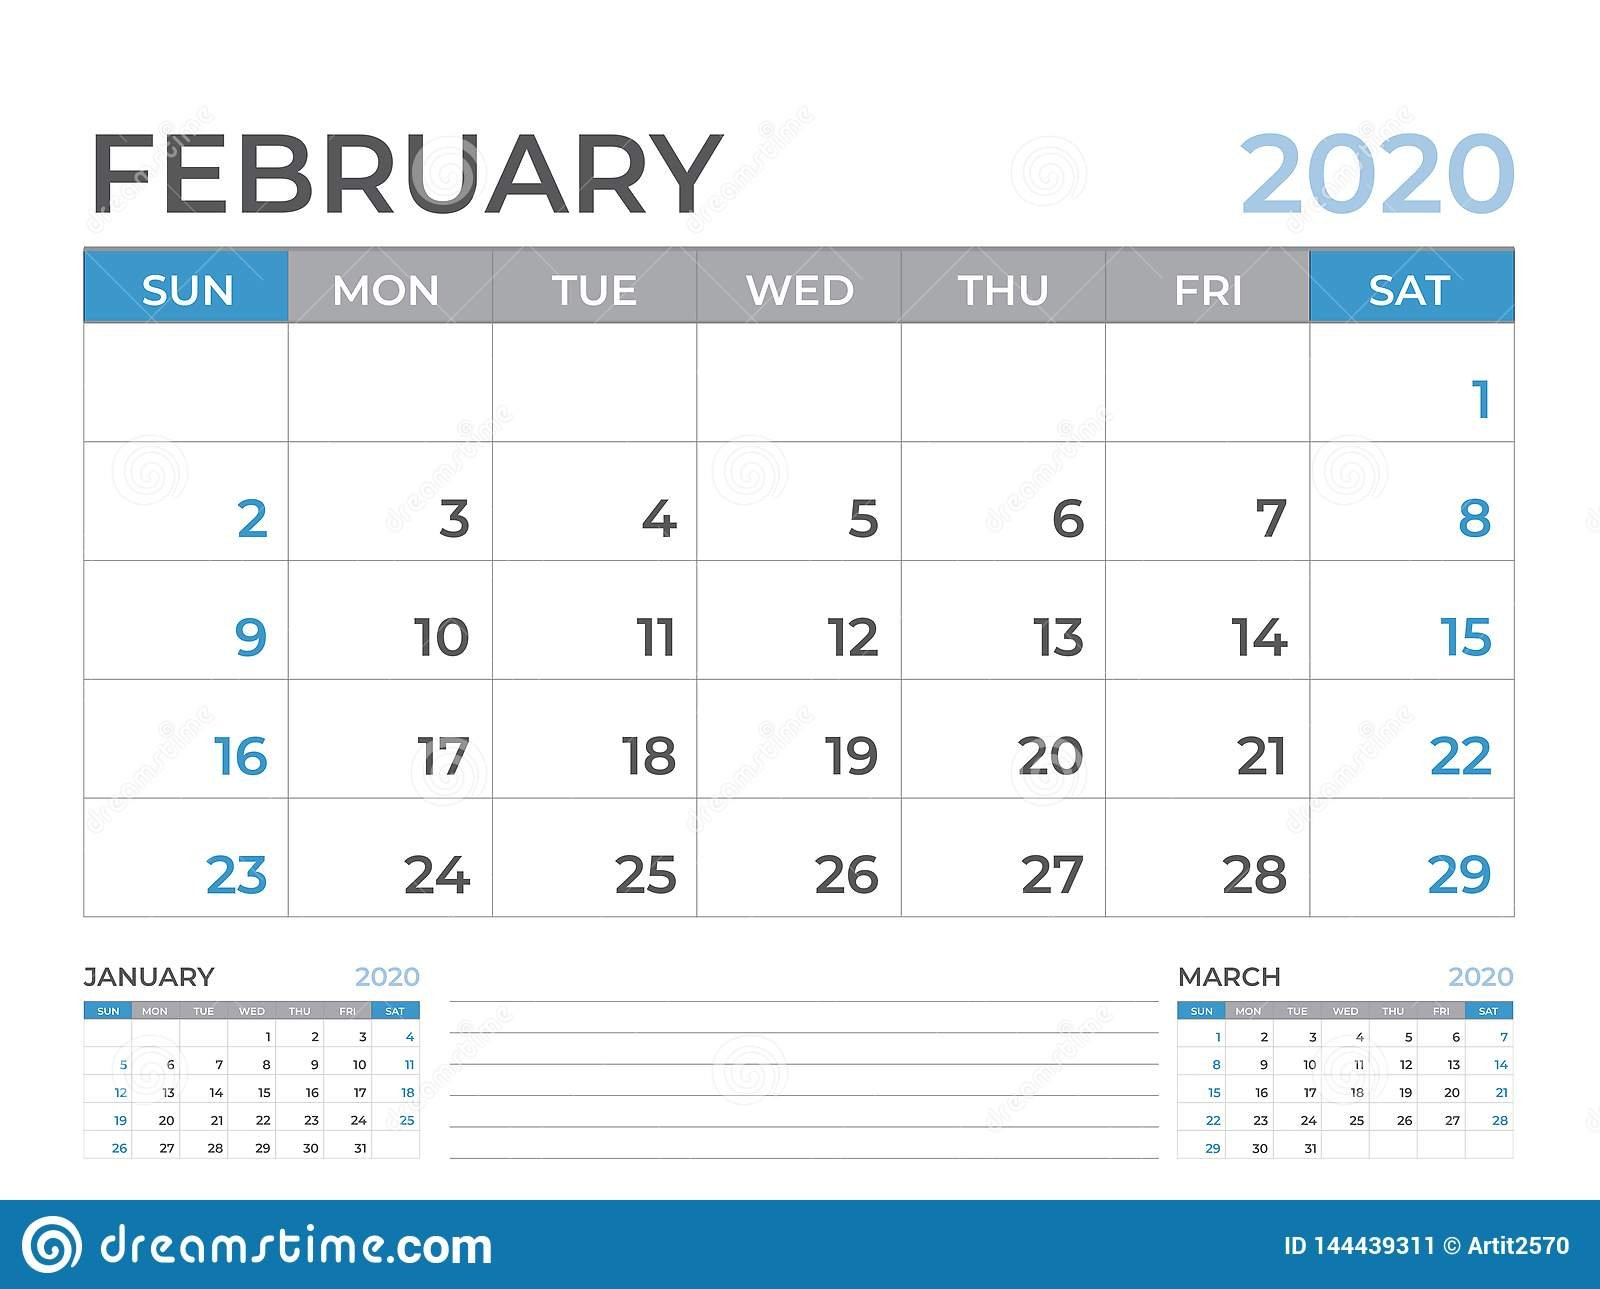 February 2020 Calendar Template, Desk Calendar Layout Size 8 Free 5 X 8 Calendar